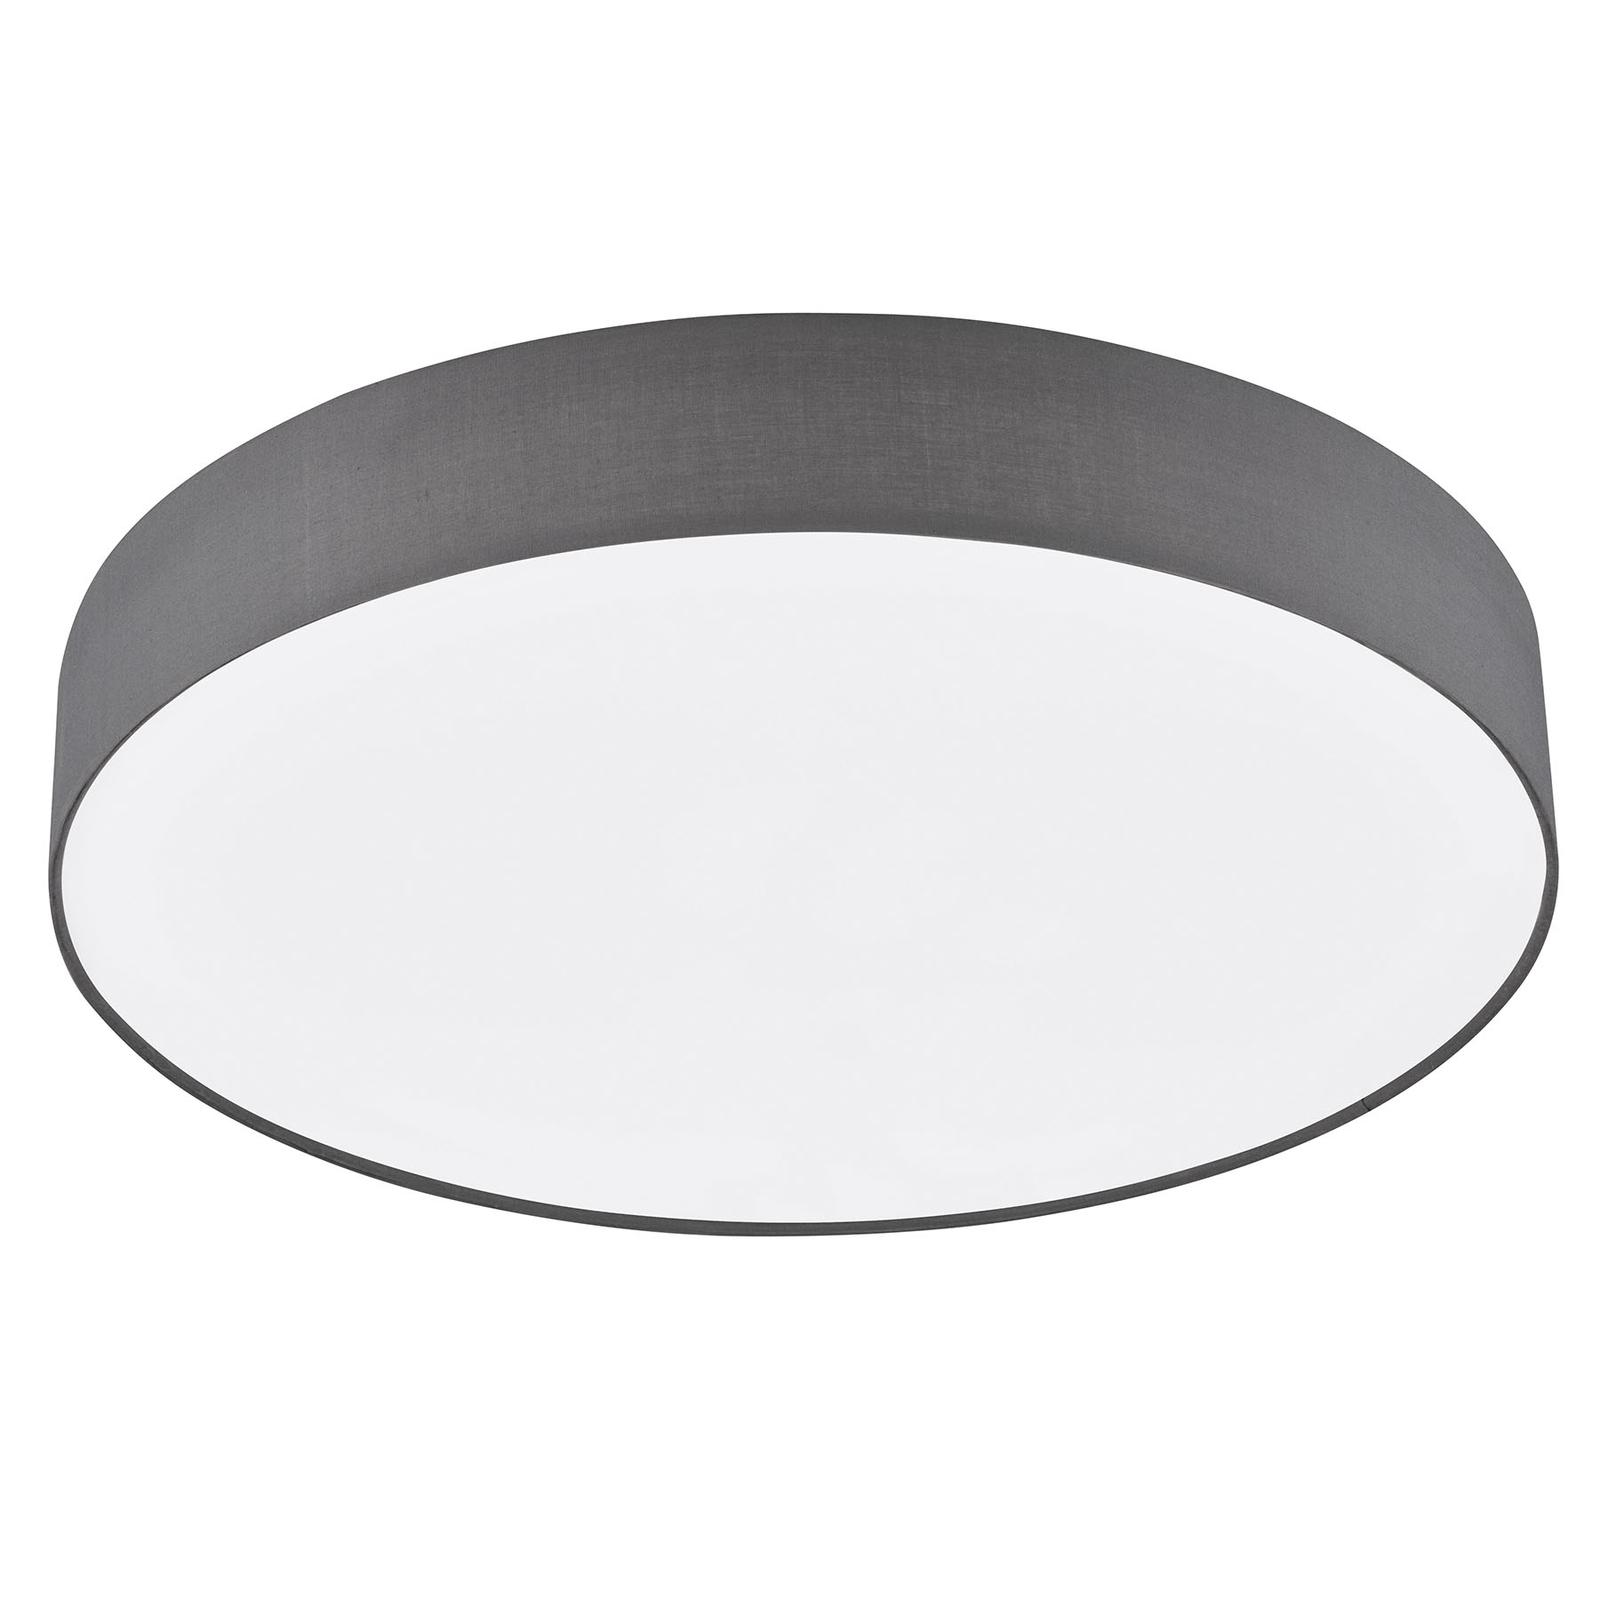 Schöner Wohnen Pina LED-loftlampe, mørkegrå